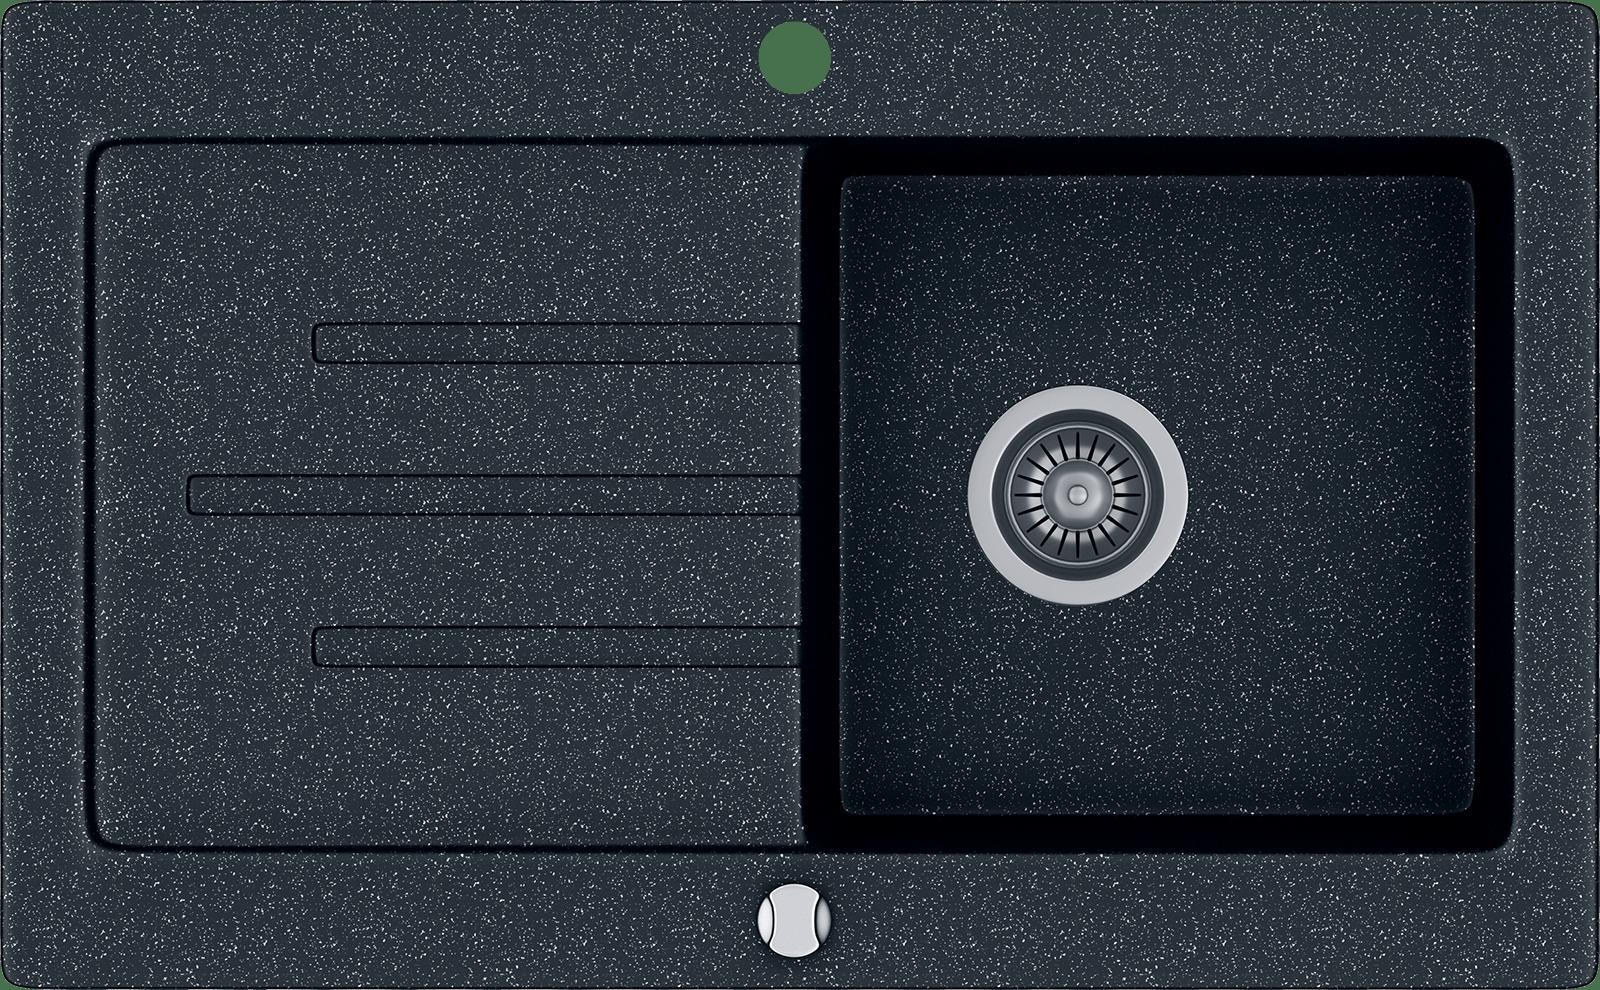 Kgs v 45 1b1d black metallic zlewozmywak granitowy czarny 19 png